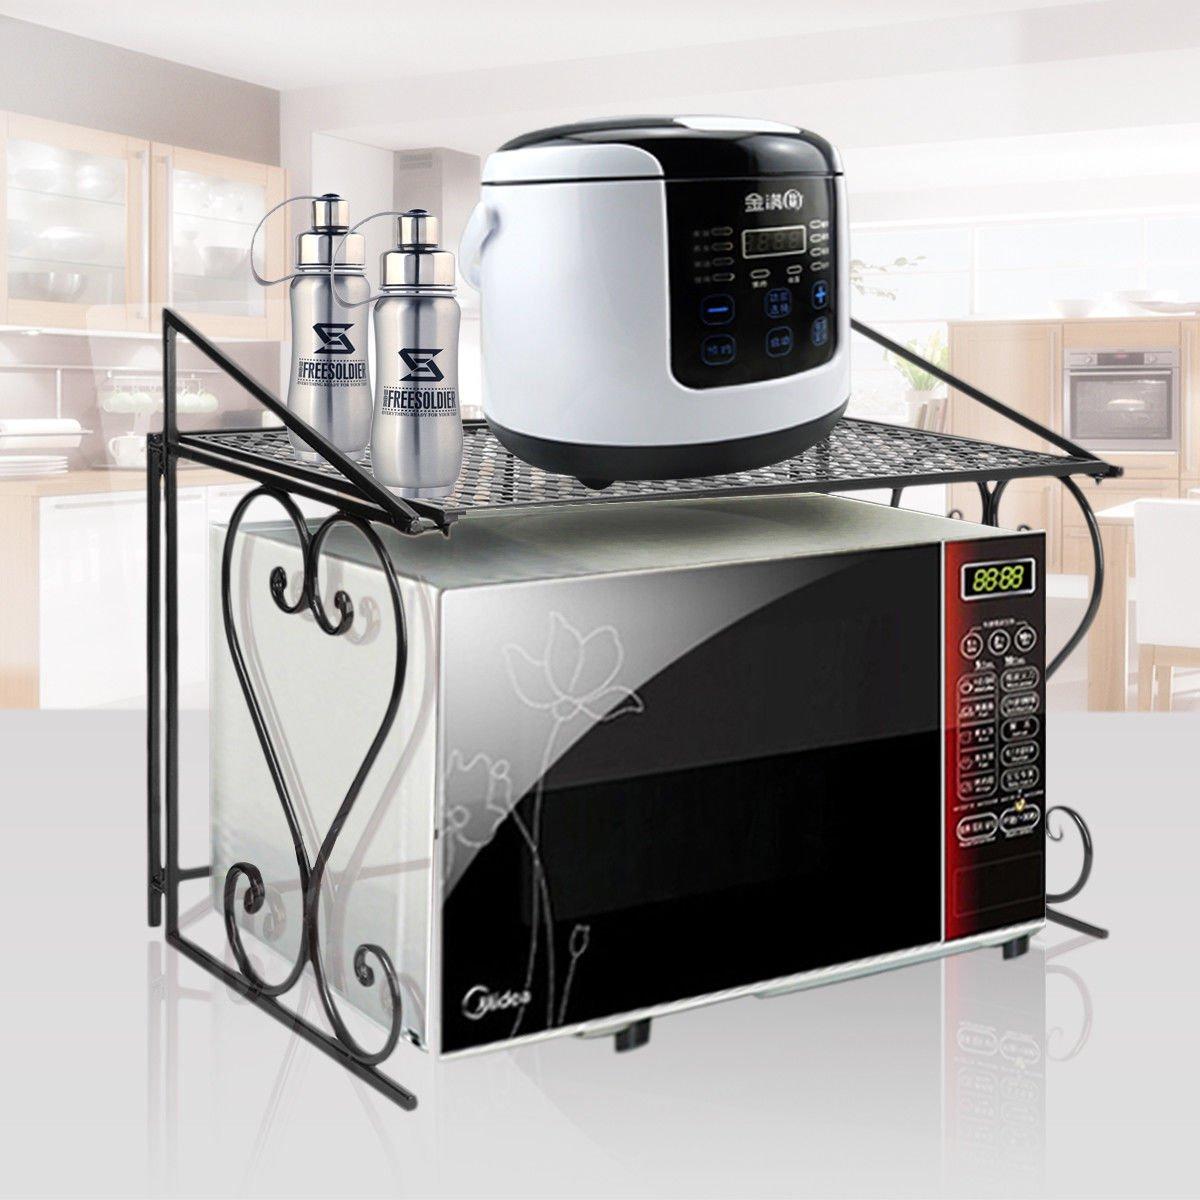 n-bright shop Wrought Iron Microwave Oven Storage Rack Stand Kitchen Organizer Counter Sturdy Metal Shelf 2 Tier